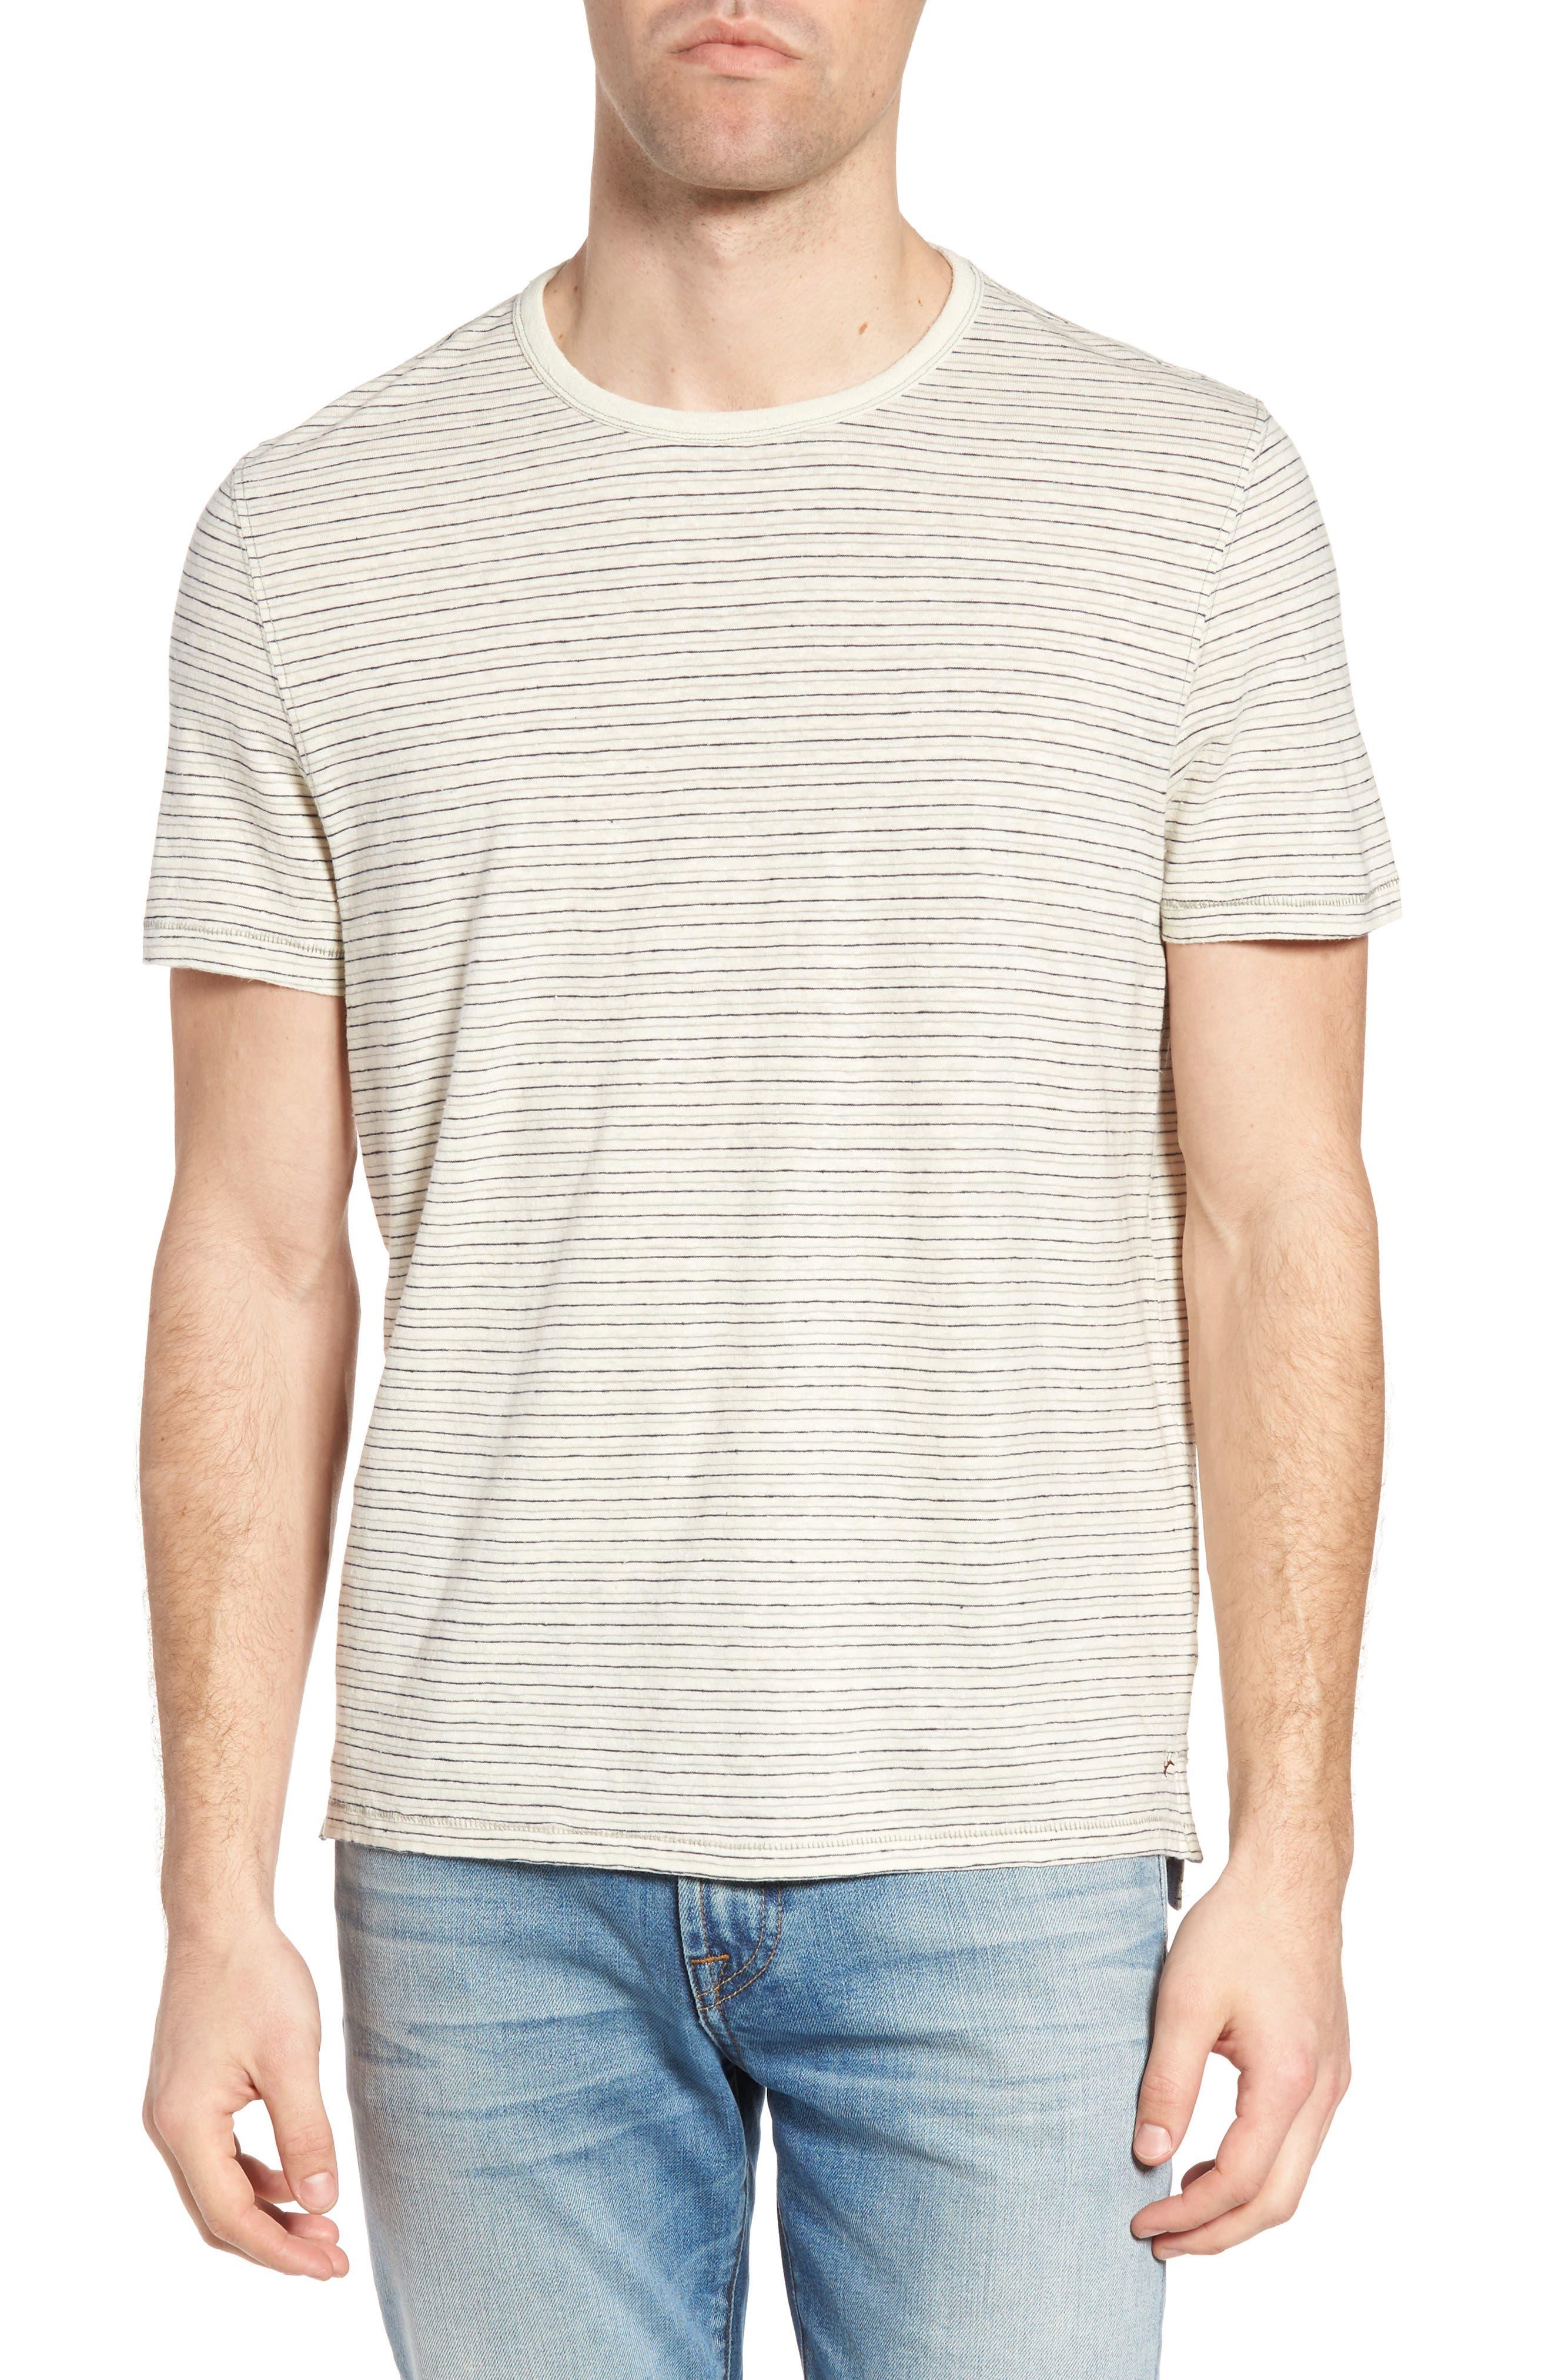 Jeremiah Stripe Hemp & Cotton T-Shirt